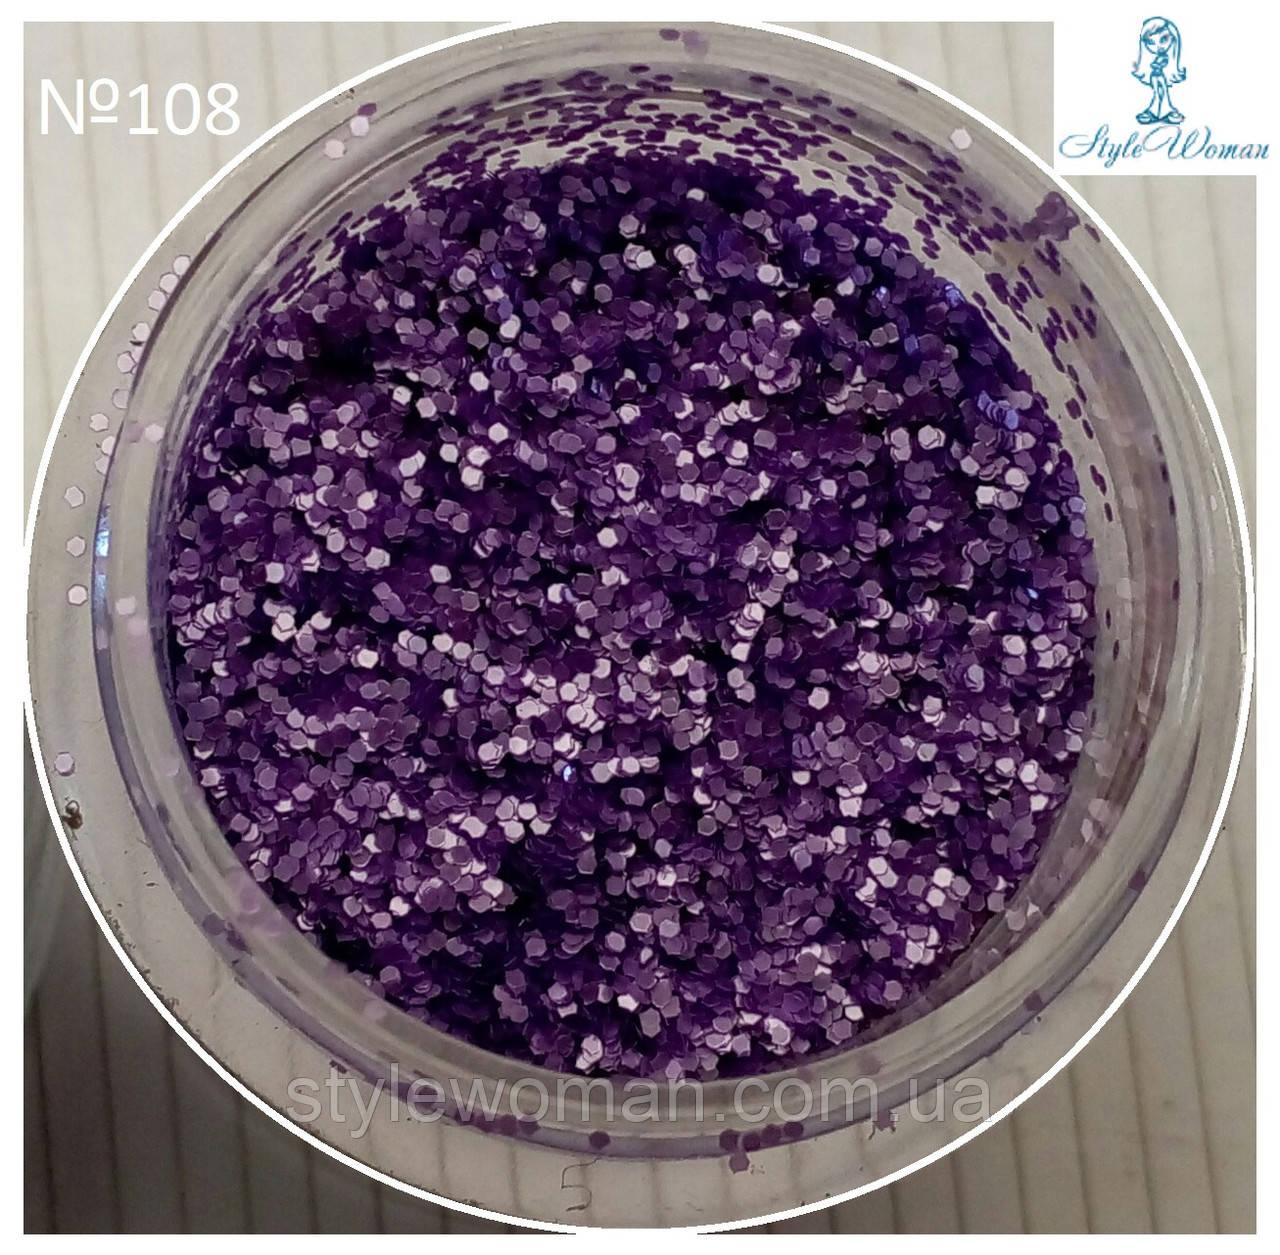 Блестки, пайетки для дизайна ногтей Mileo Professional Nail Art присыпка Милео №108